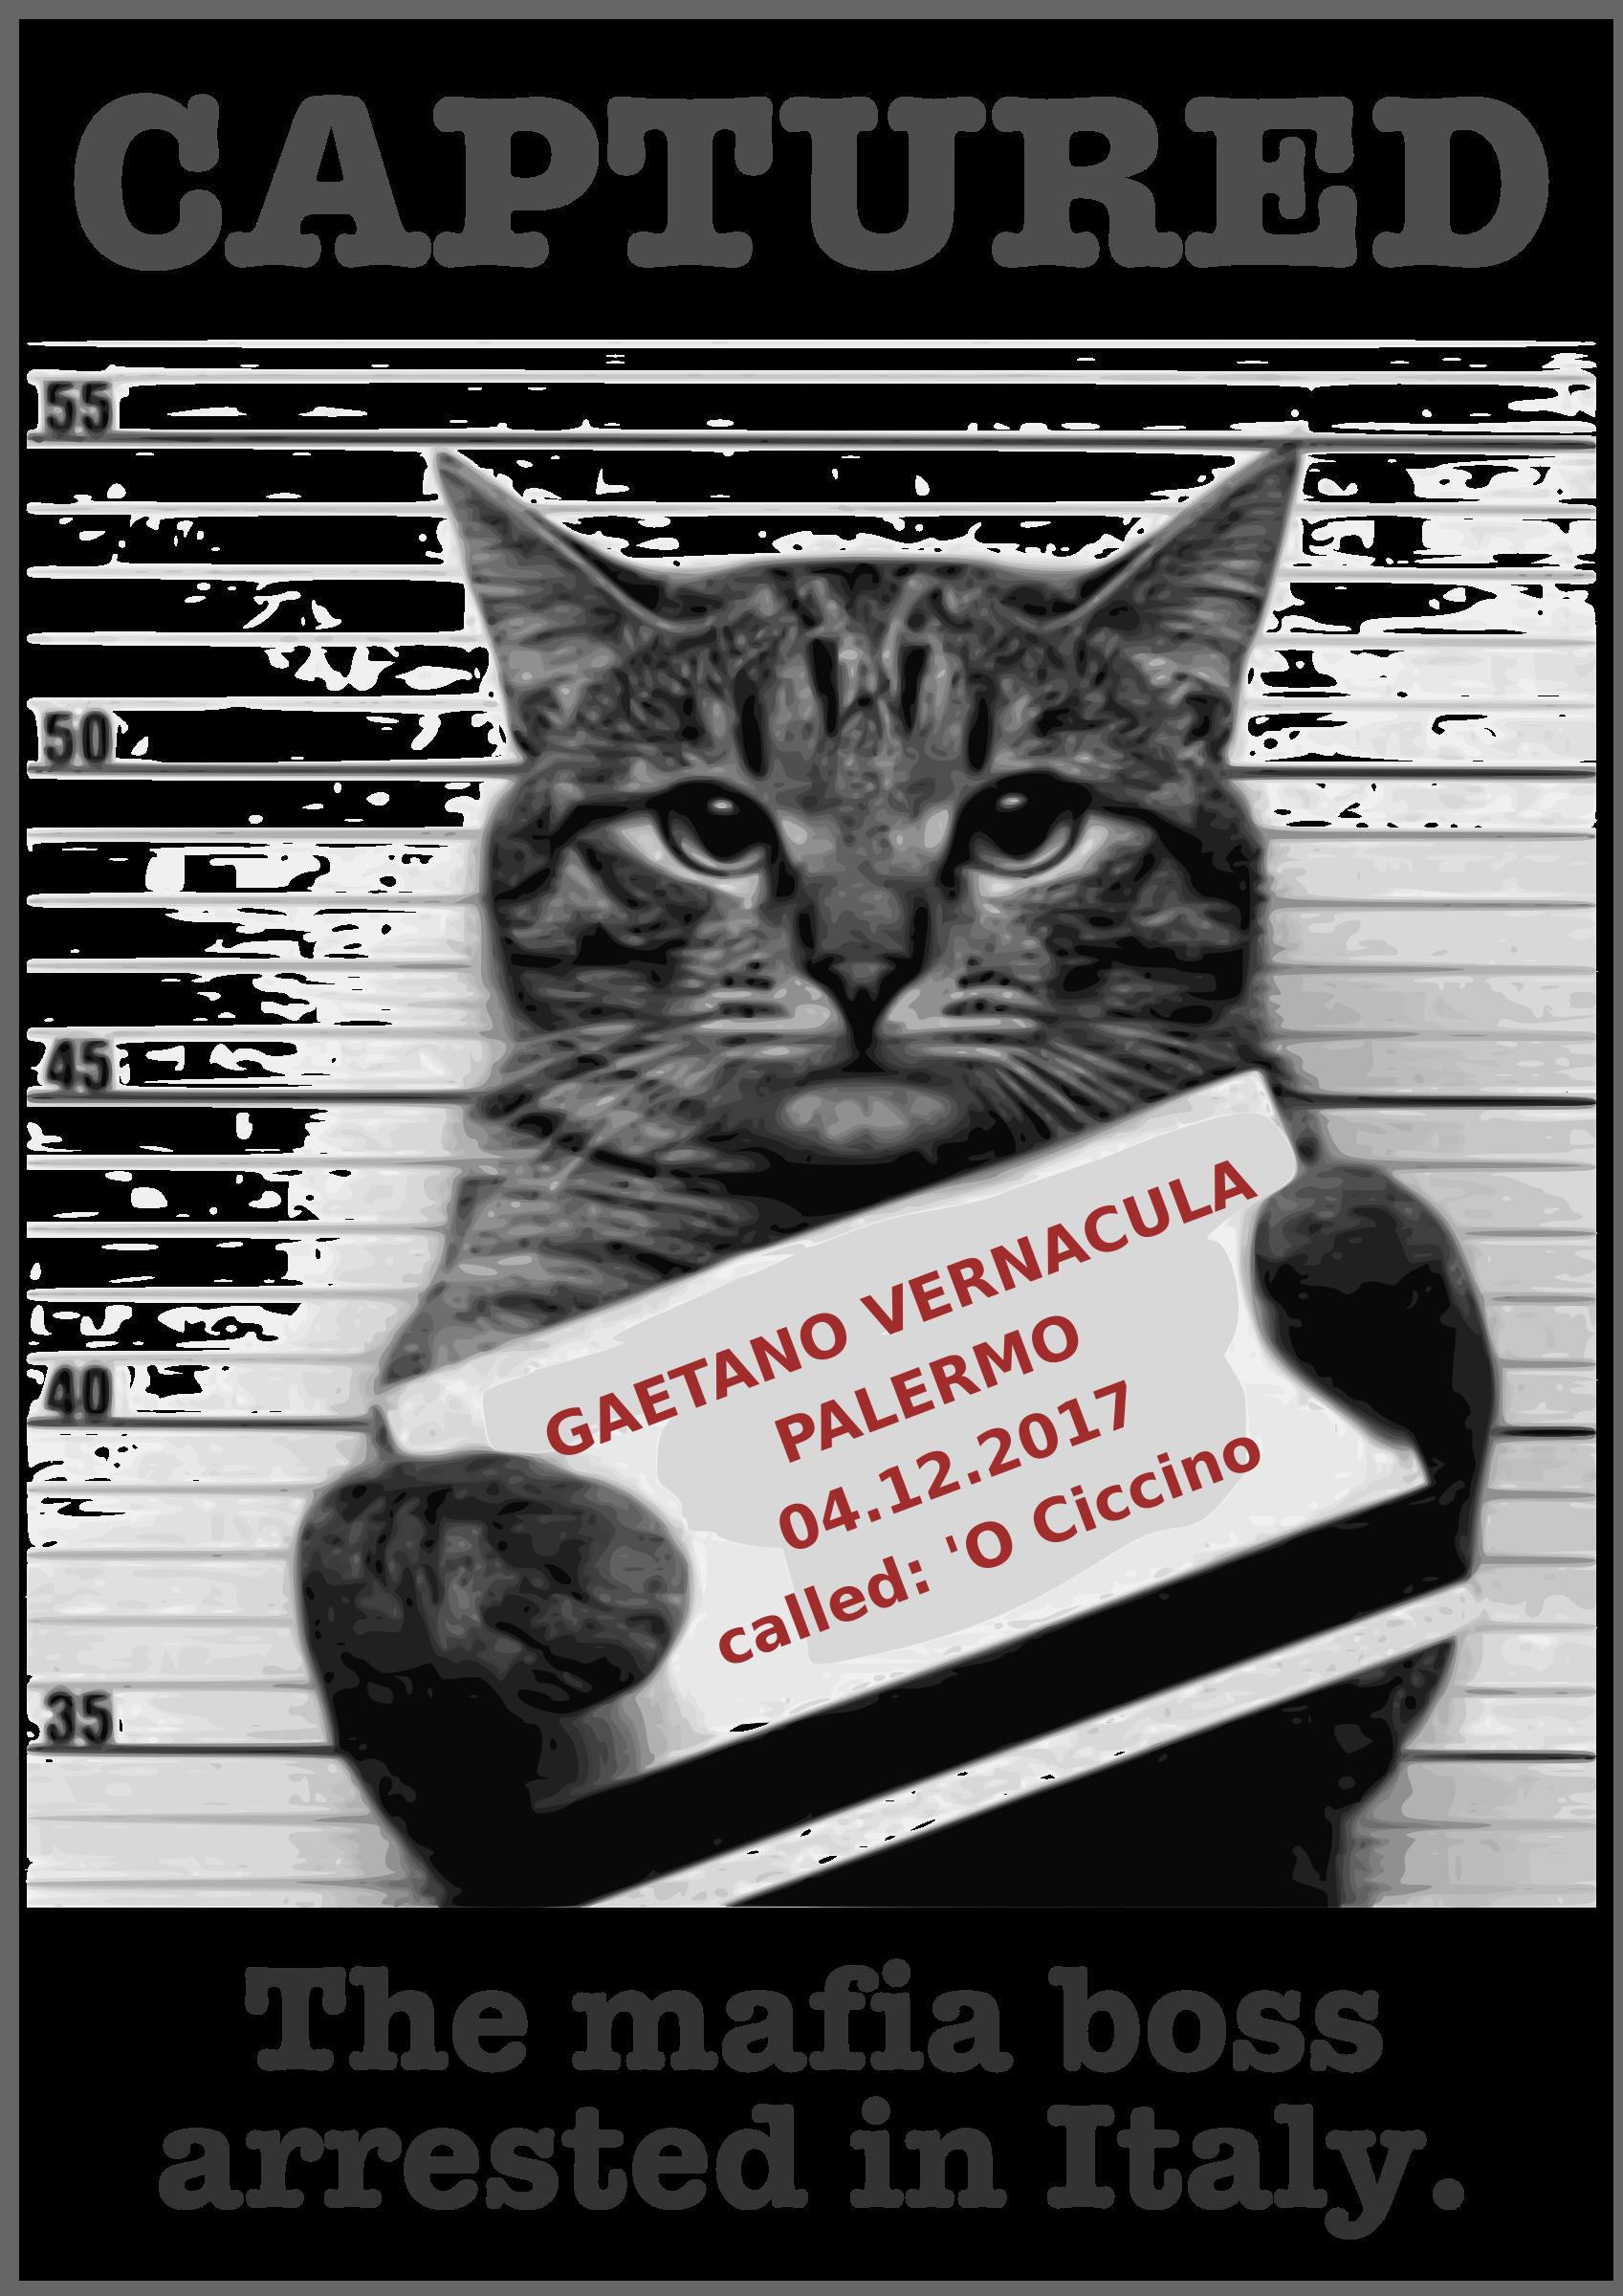 Crime clipart captured. Mafia big image png